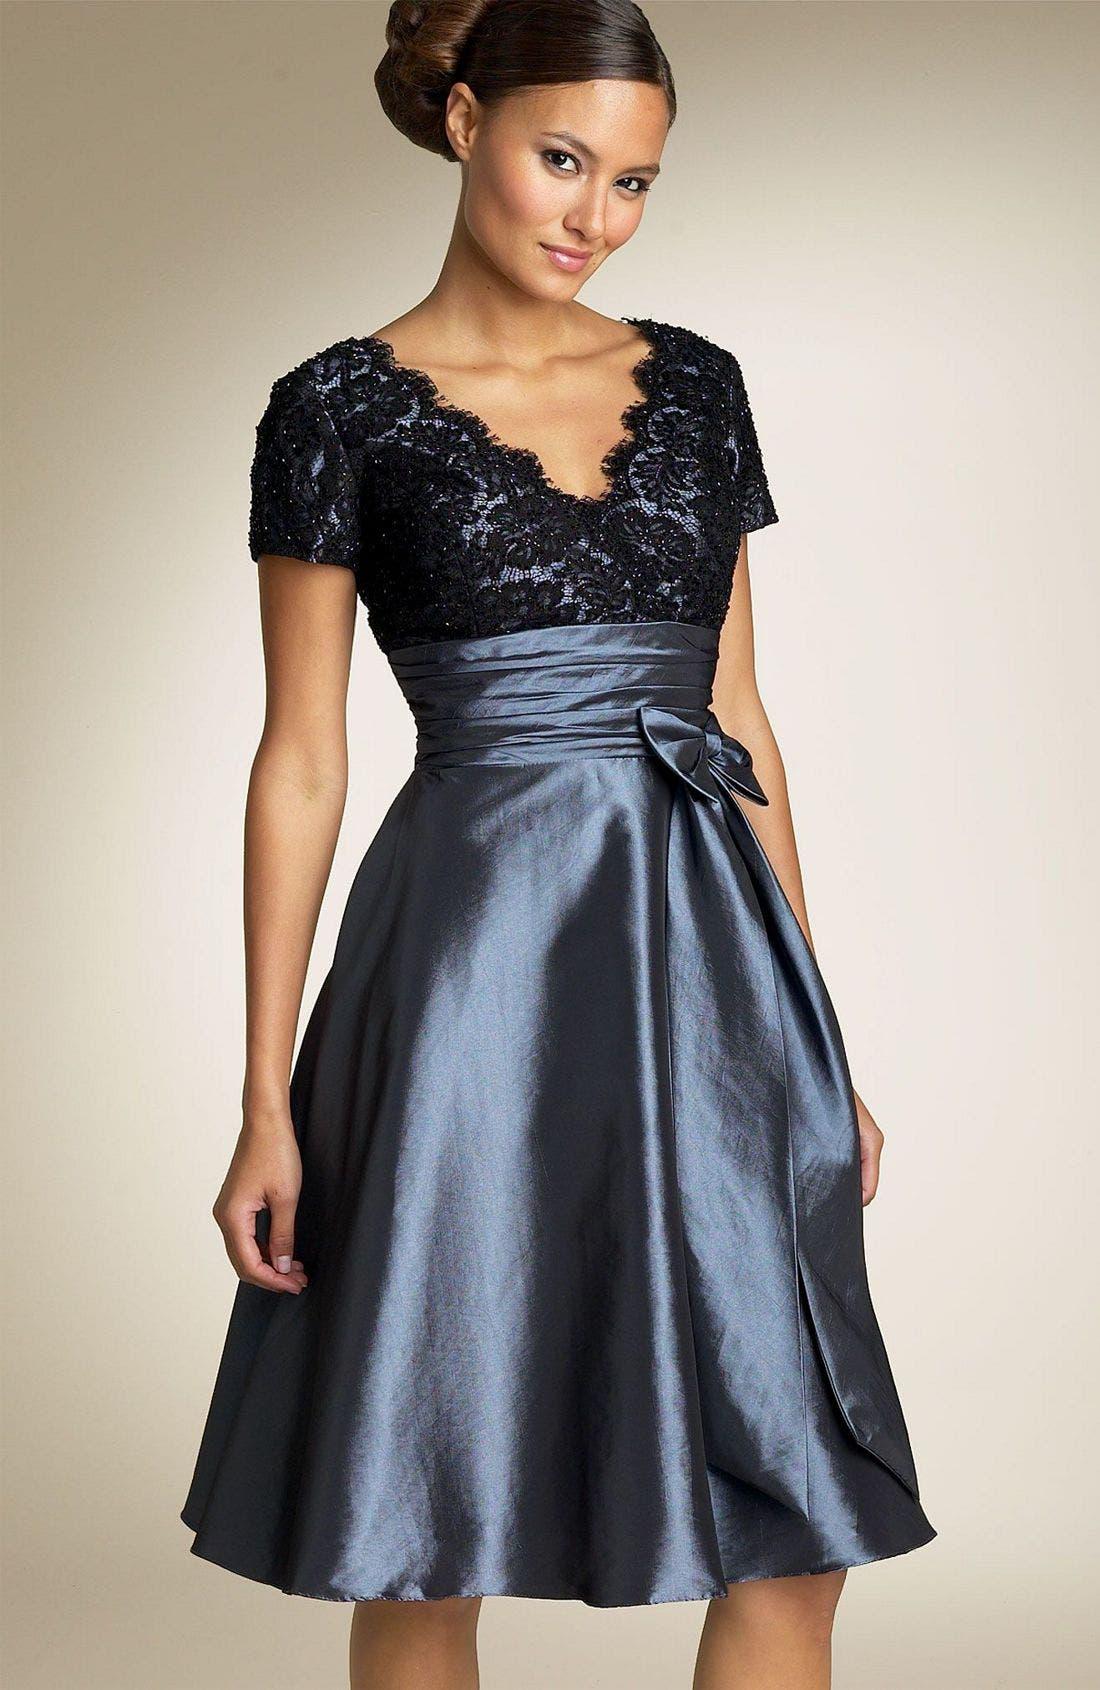 Alternate Image 1 Selected - JS Boutique Cap Sleeve Lace & Taffeta Dress